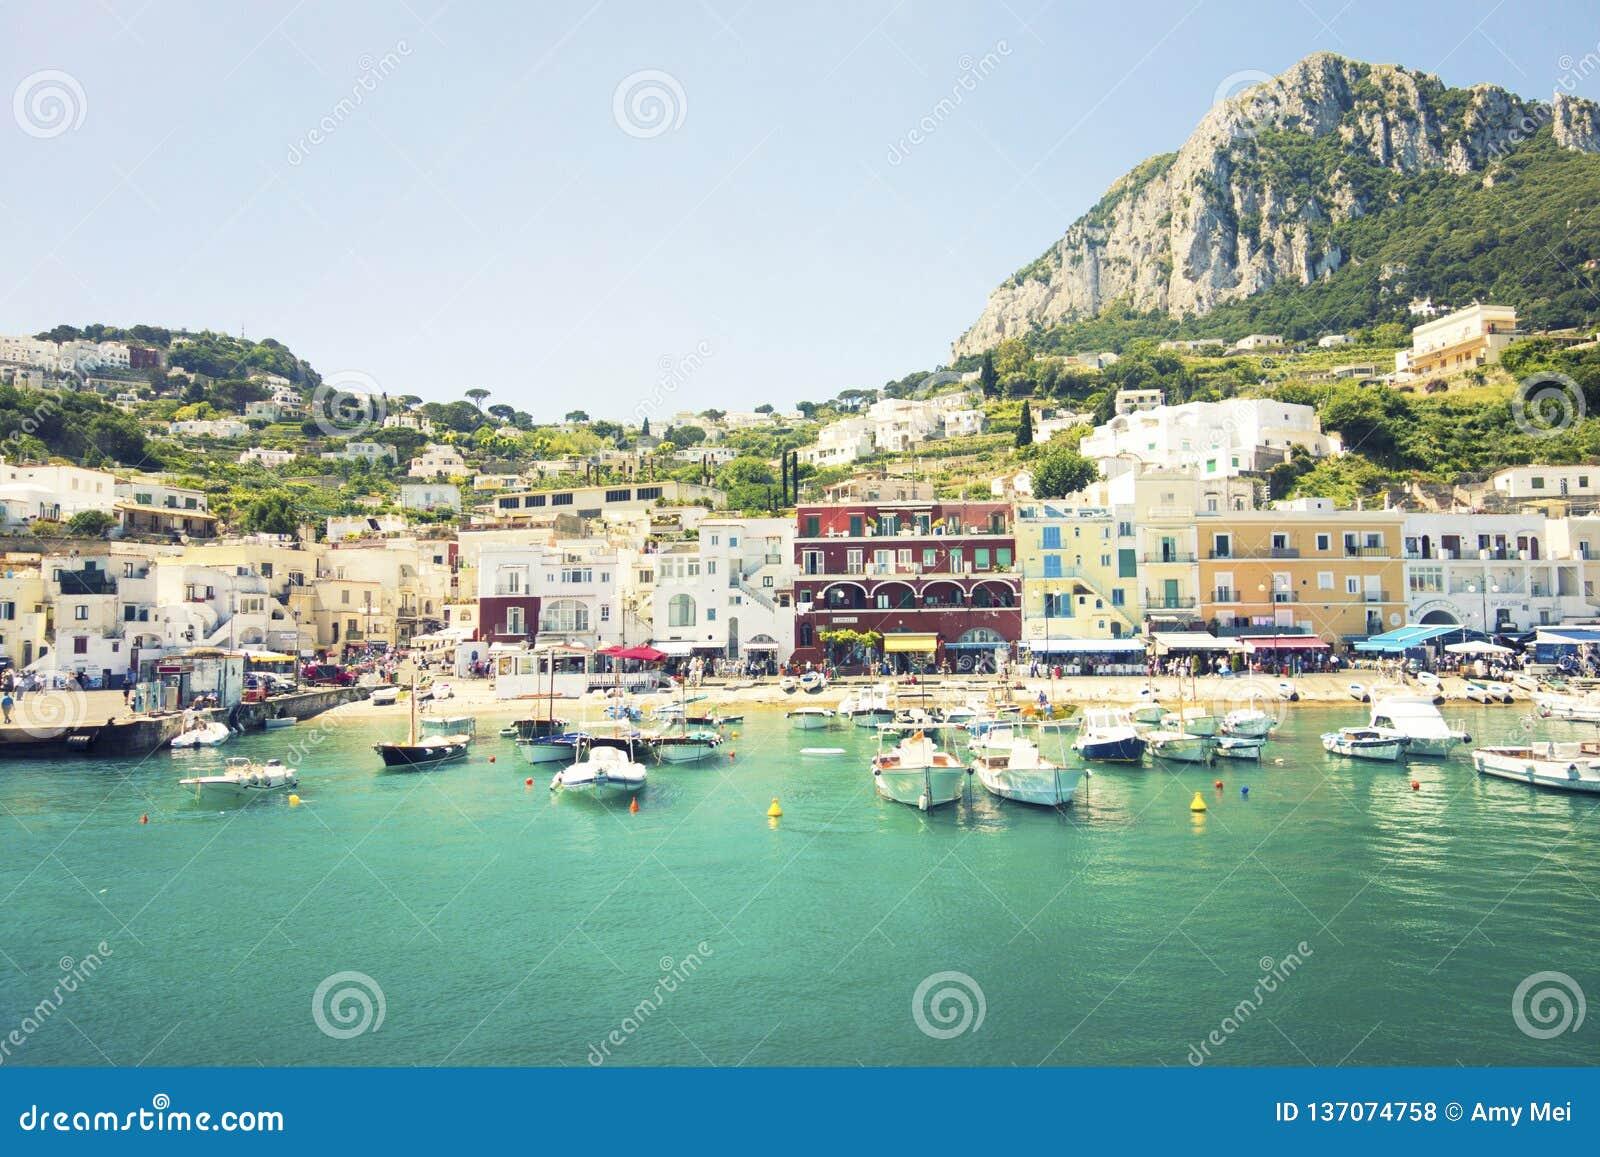 Devanture de magasin colorés de Capri, Italie